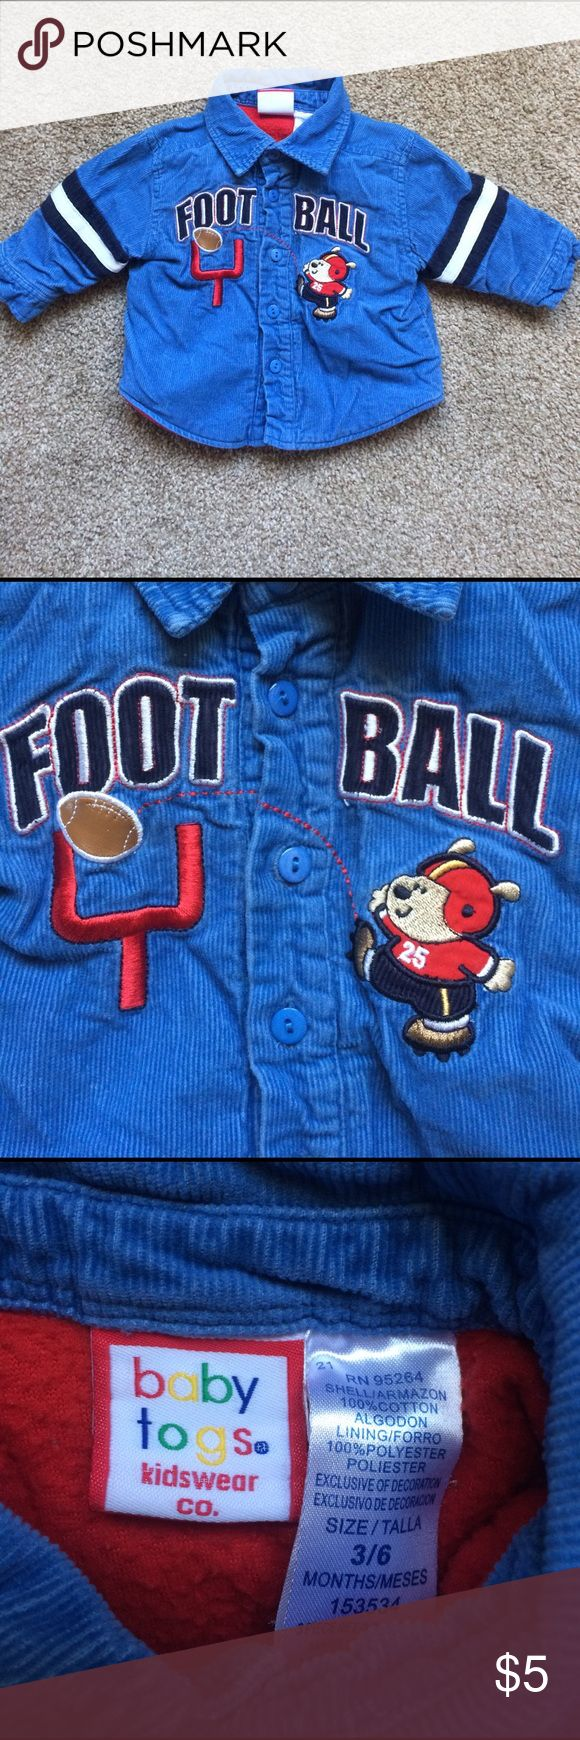 Corduroy Football Jacket Good condition Jackets & Coats